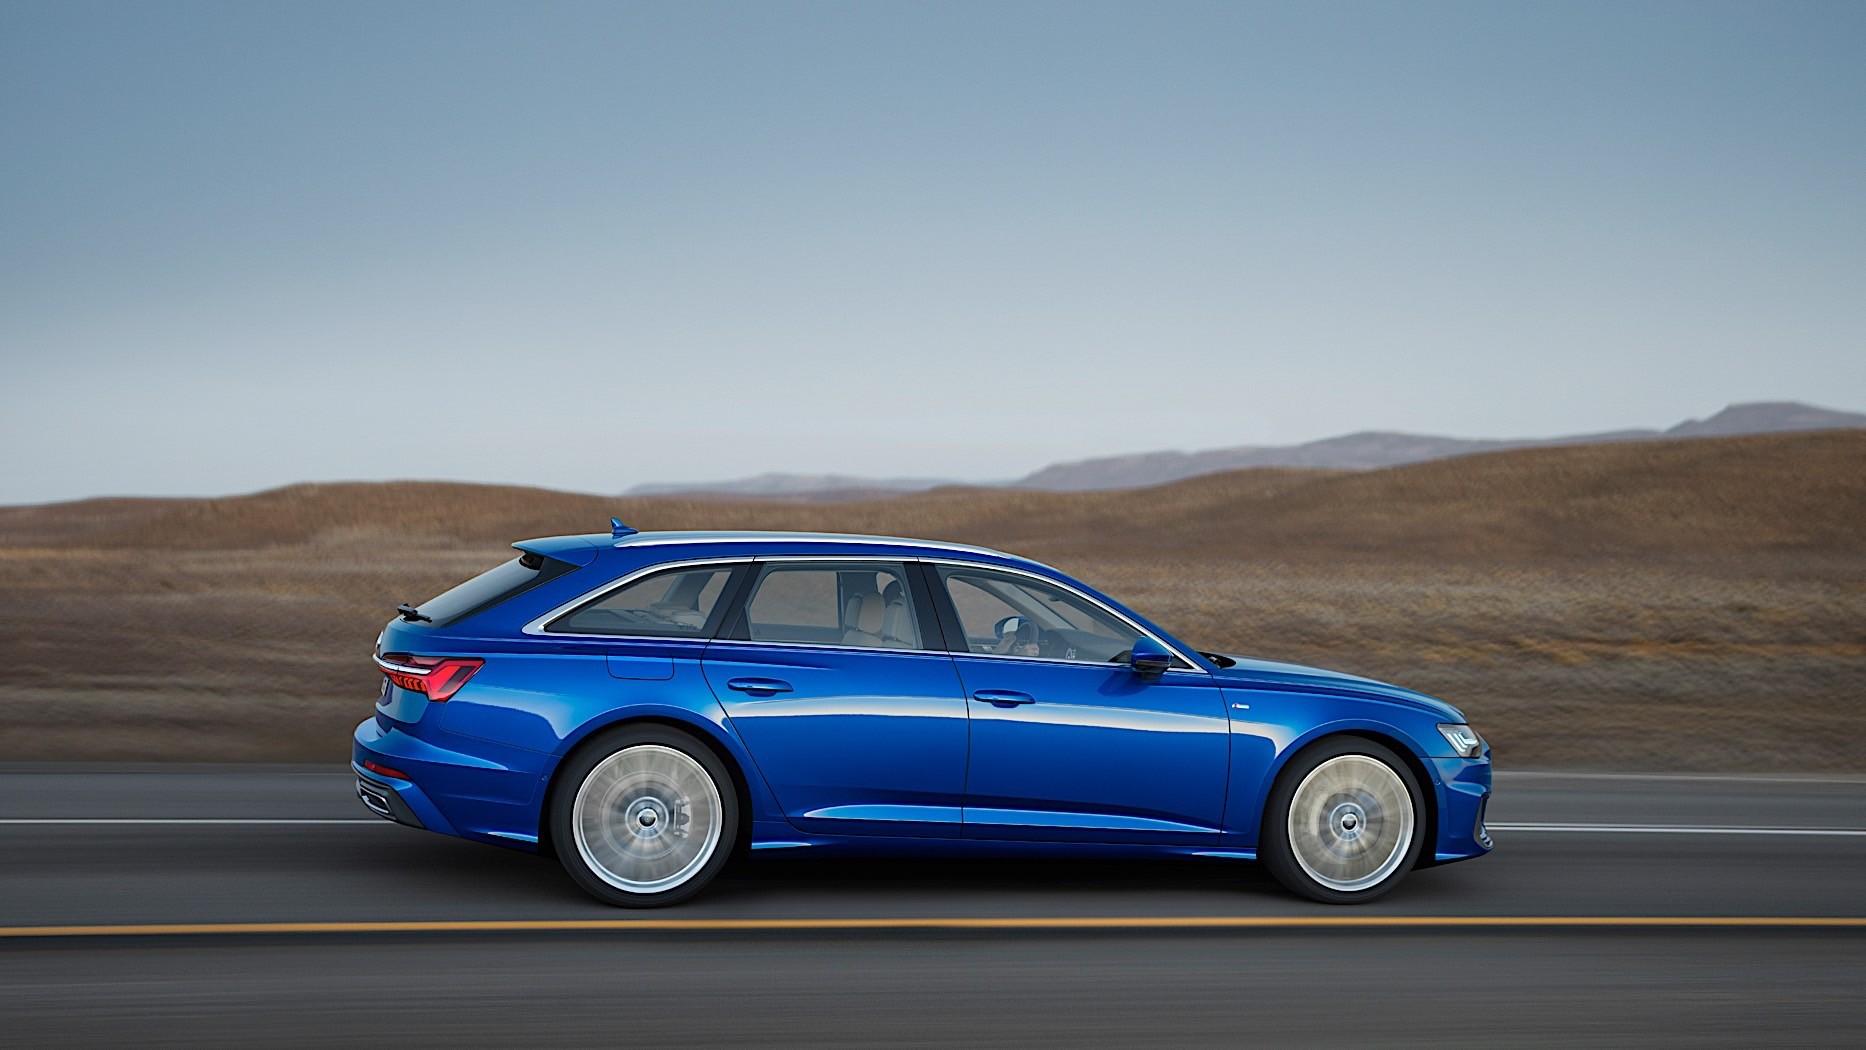 2019 Audi A6 Avant Unwrapped With Standard Mild Hybrid Autoevolution